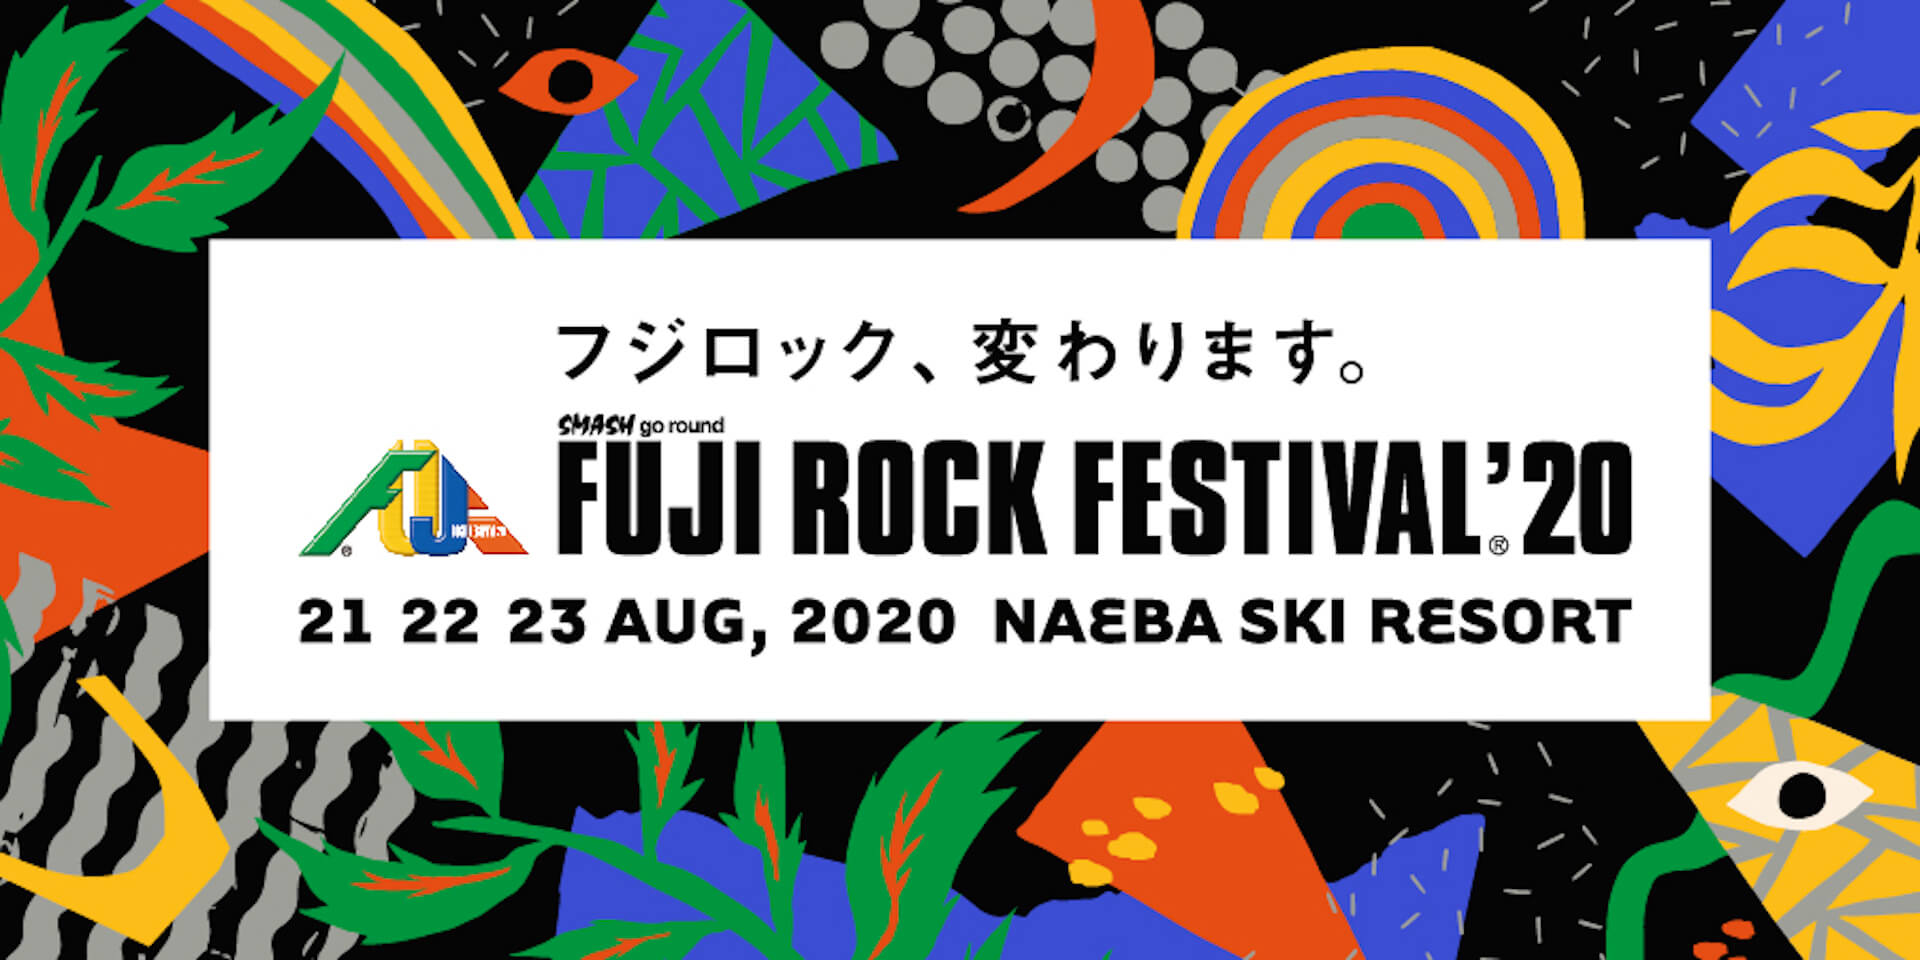 <FUJI ROCK FESTIVAL '20>開催決定!今年は8月開催&約200アーティスト出演 music200110_fujirockfestival_2